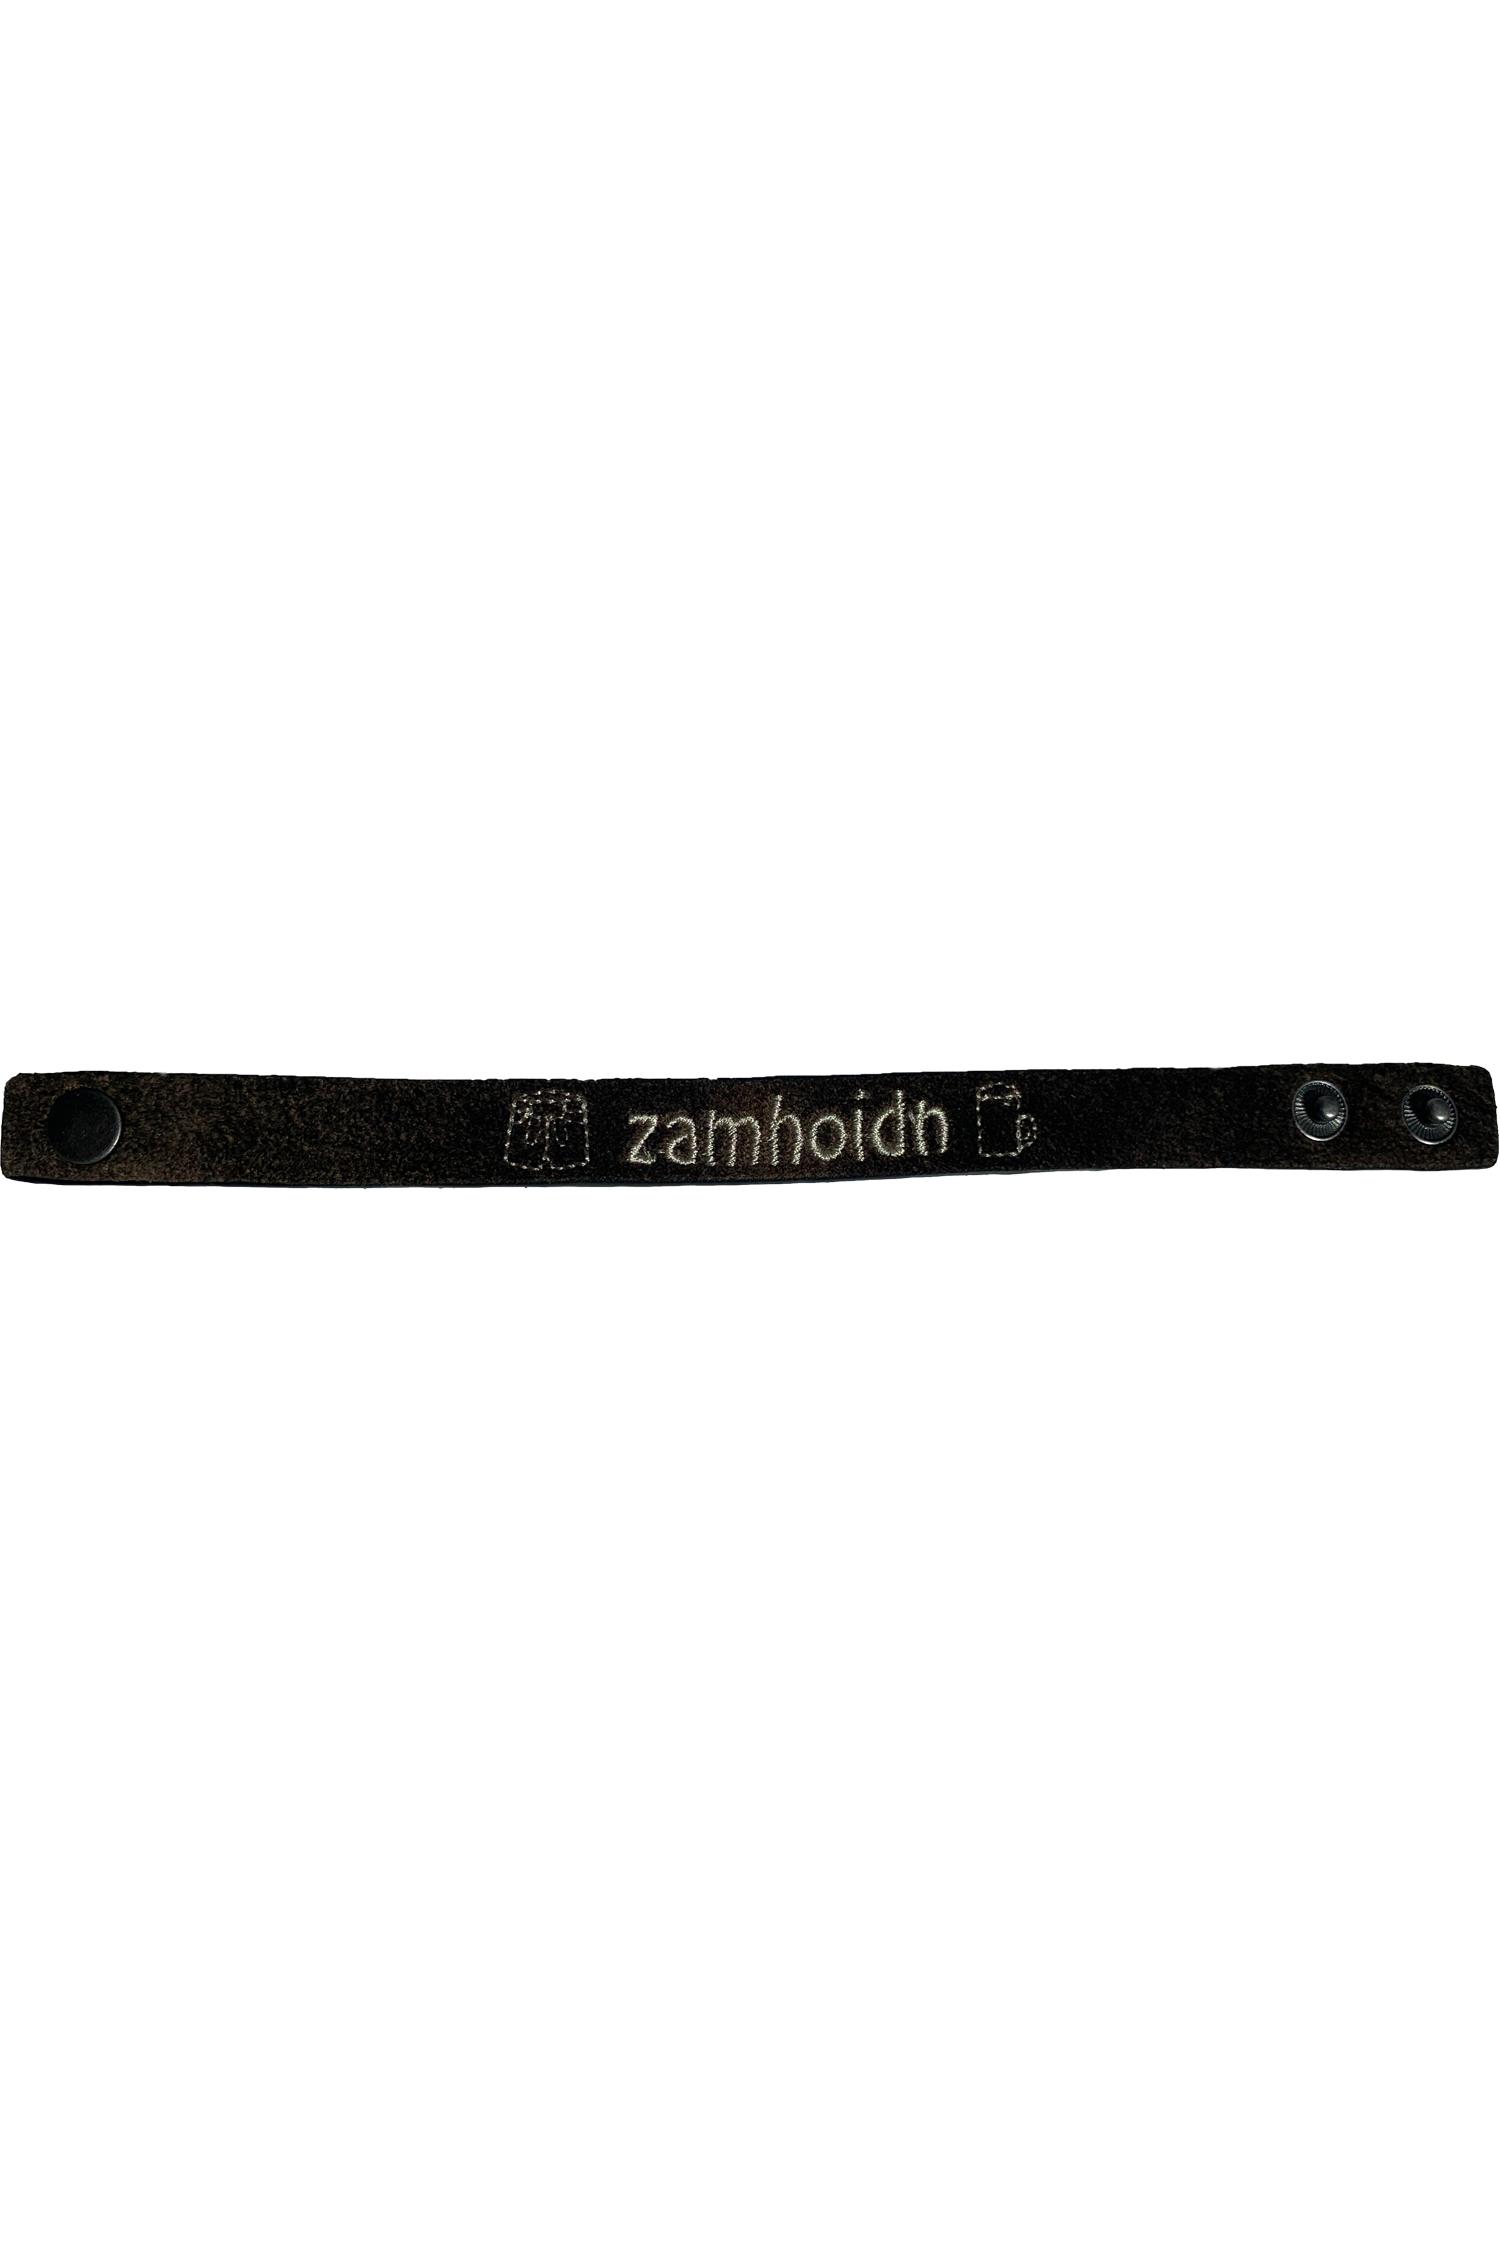 Armband Zamhoidn Herren * | dunkelbraun